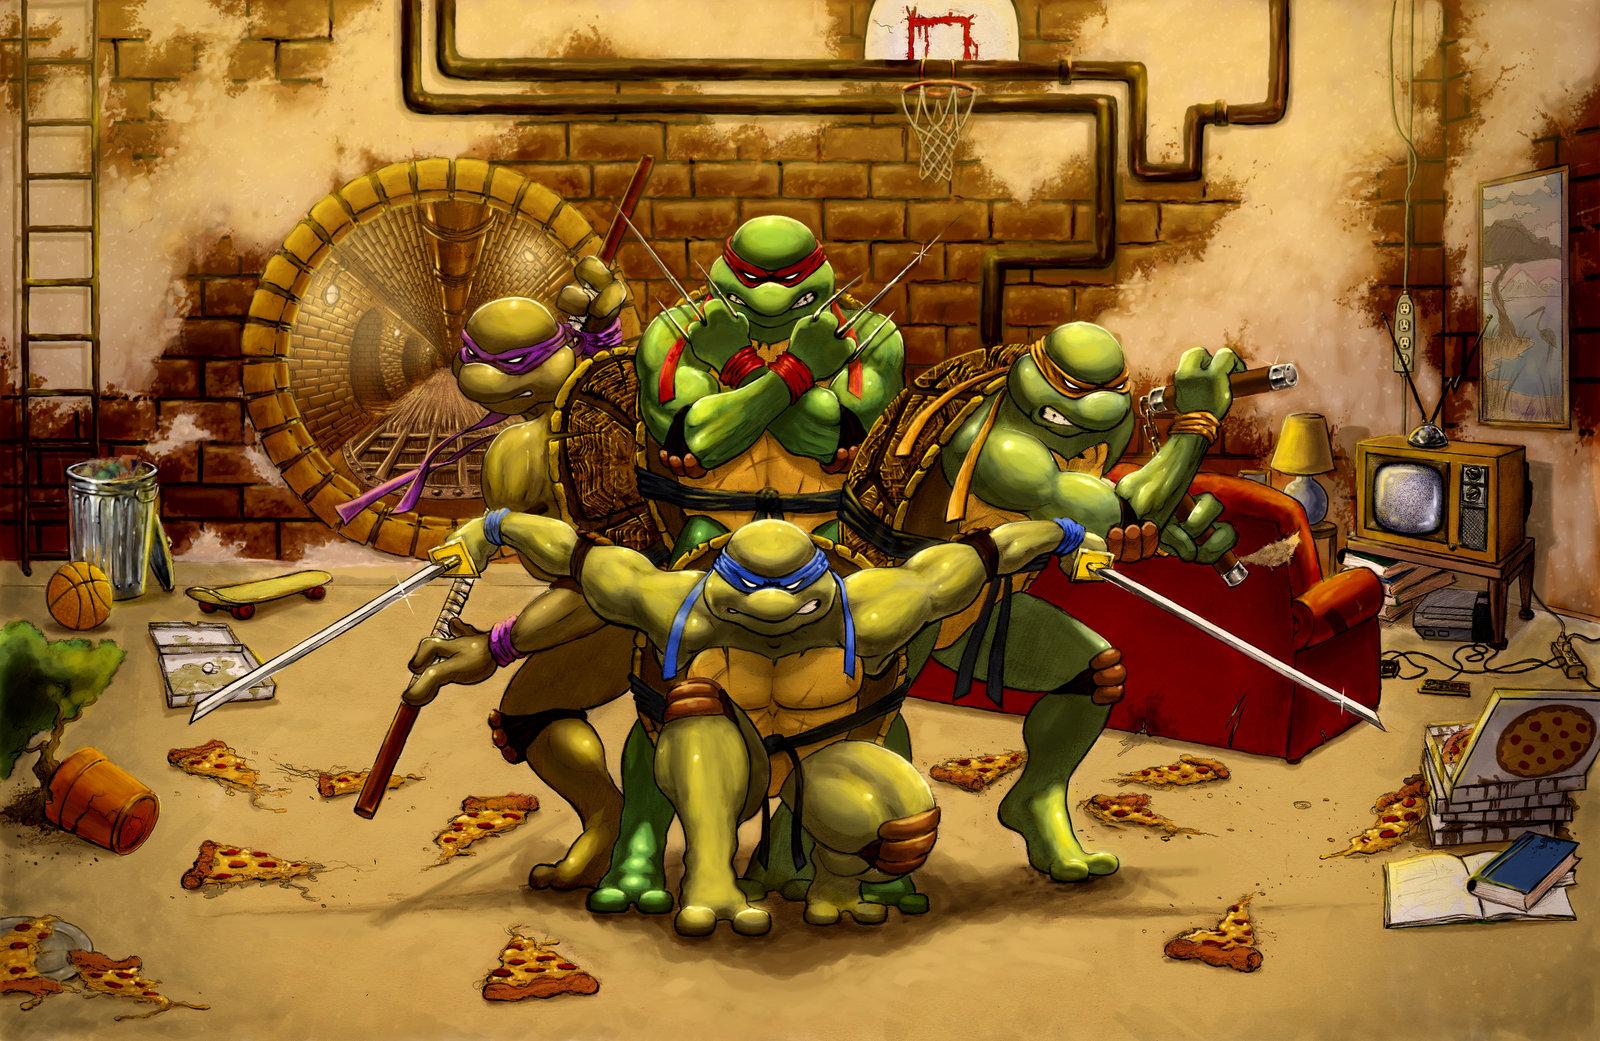 ninja turtles wallpaper (49 wallpapers) – adorable wallpapers